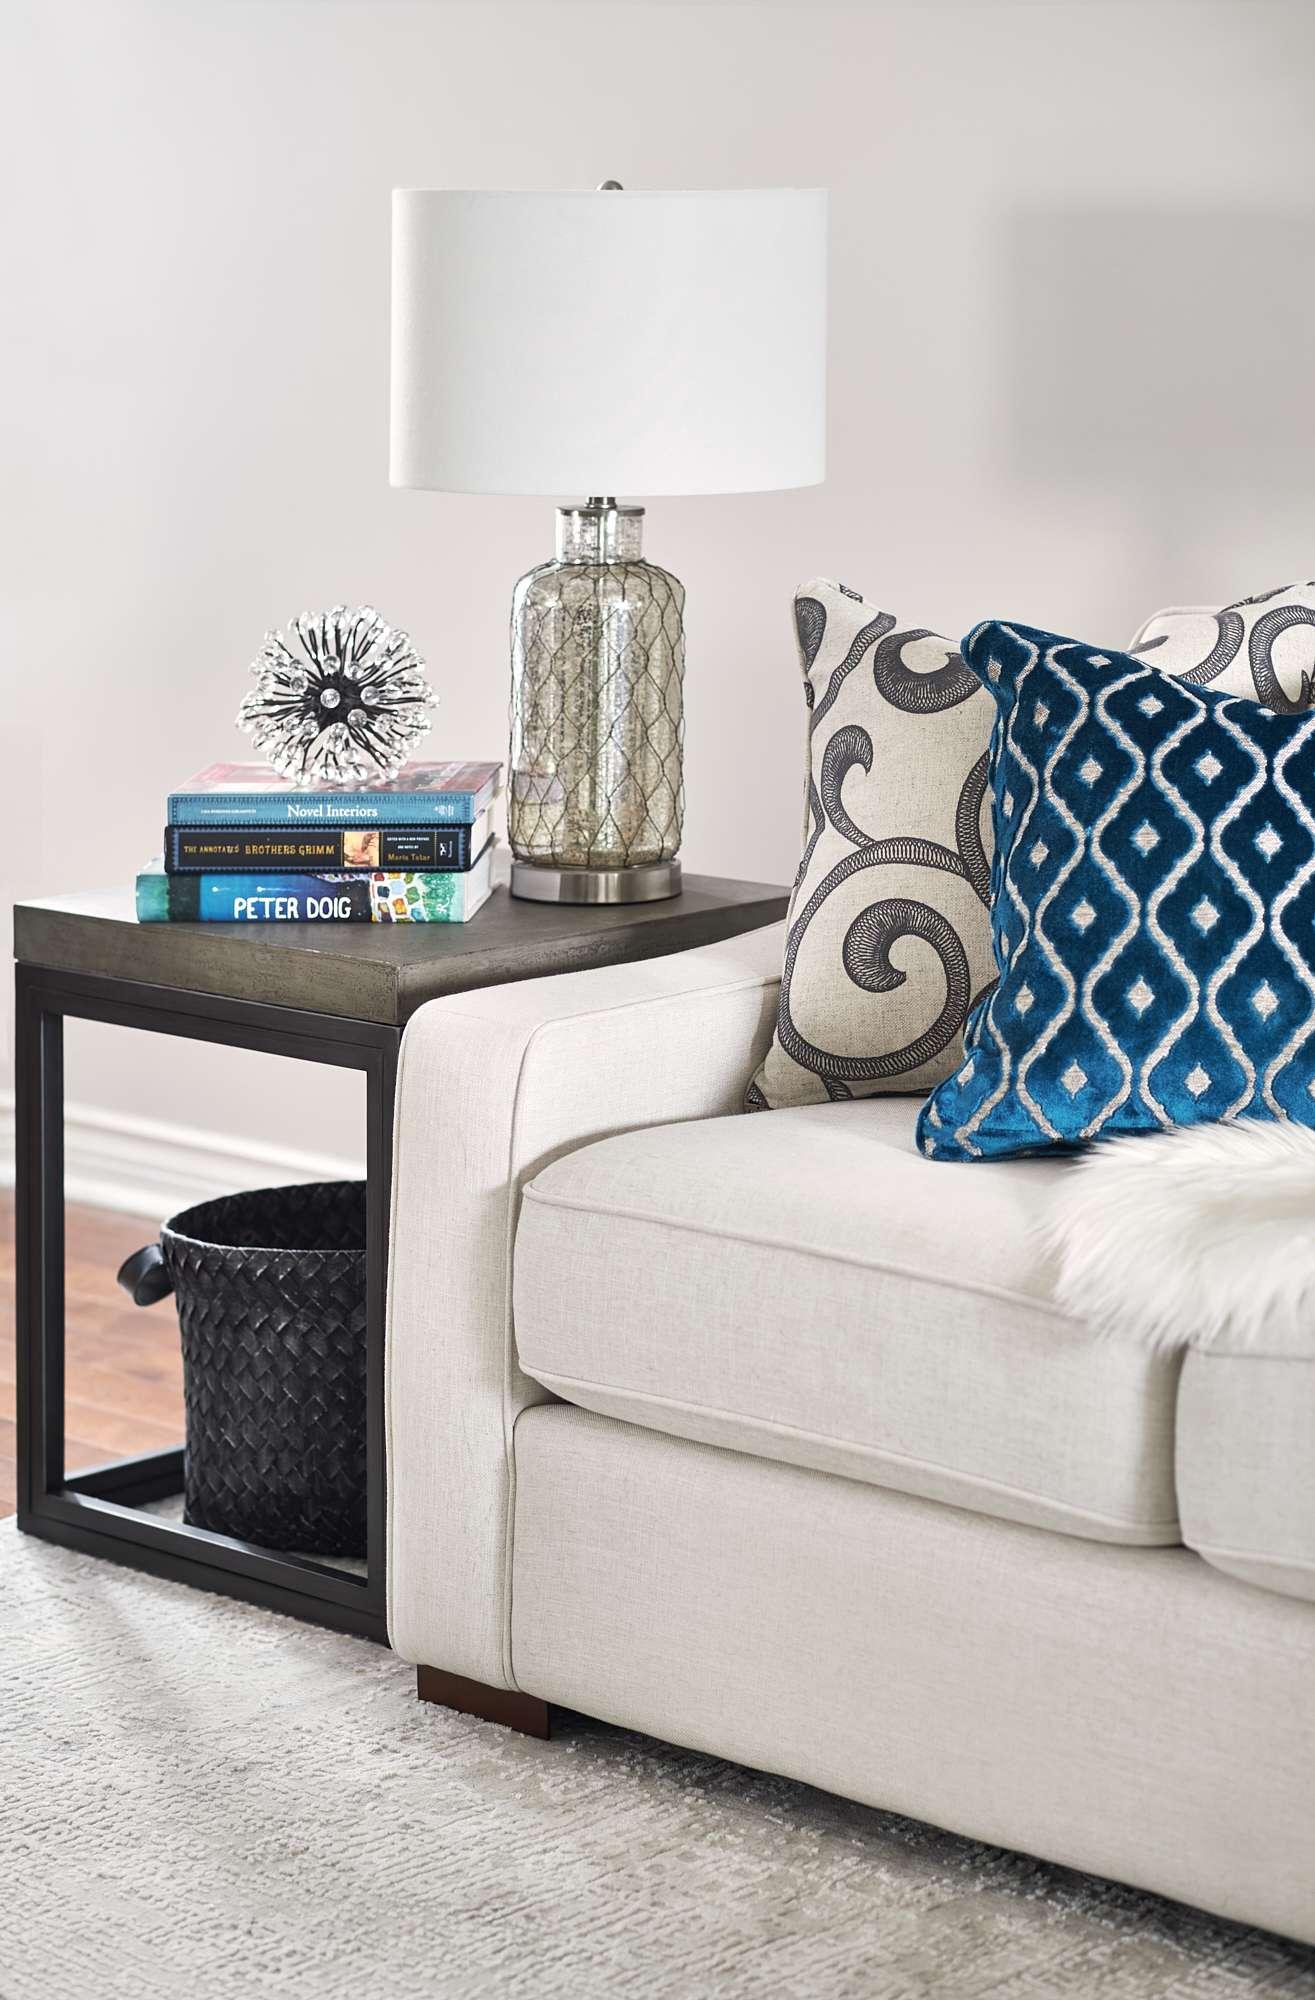 Interior design custom down toss cushions teal accents